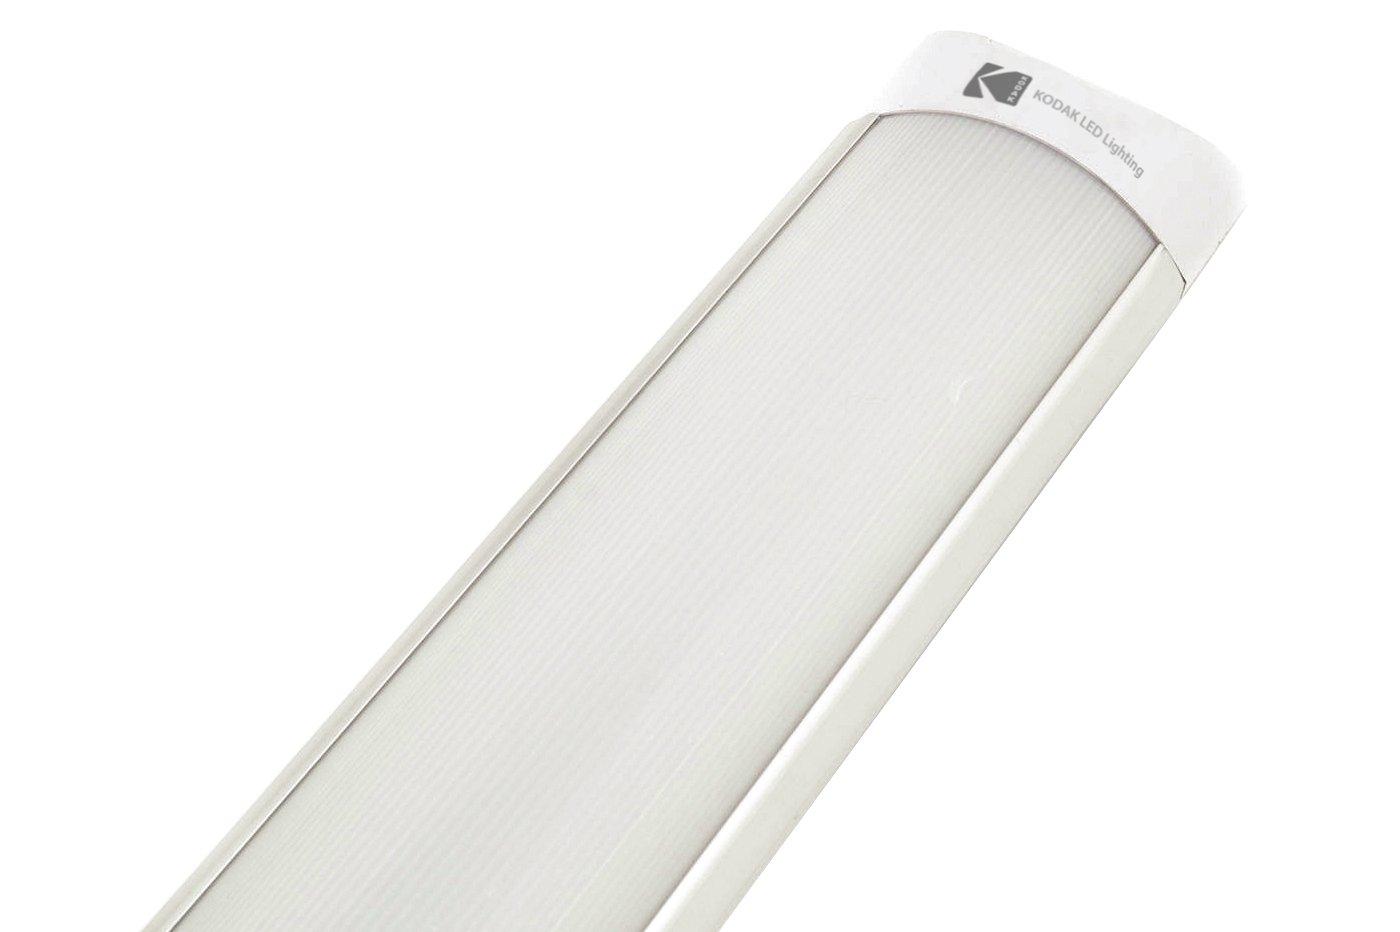 Plafoniera Led Soffitto 150 Cm : Plafoniera led w luce calda cm slim smd soffitto amazon